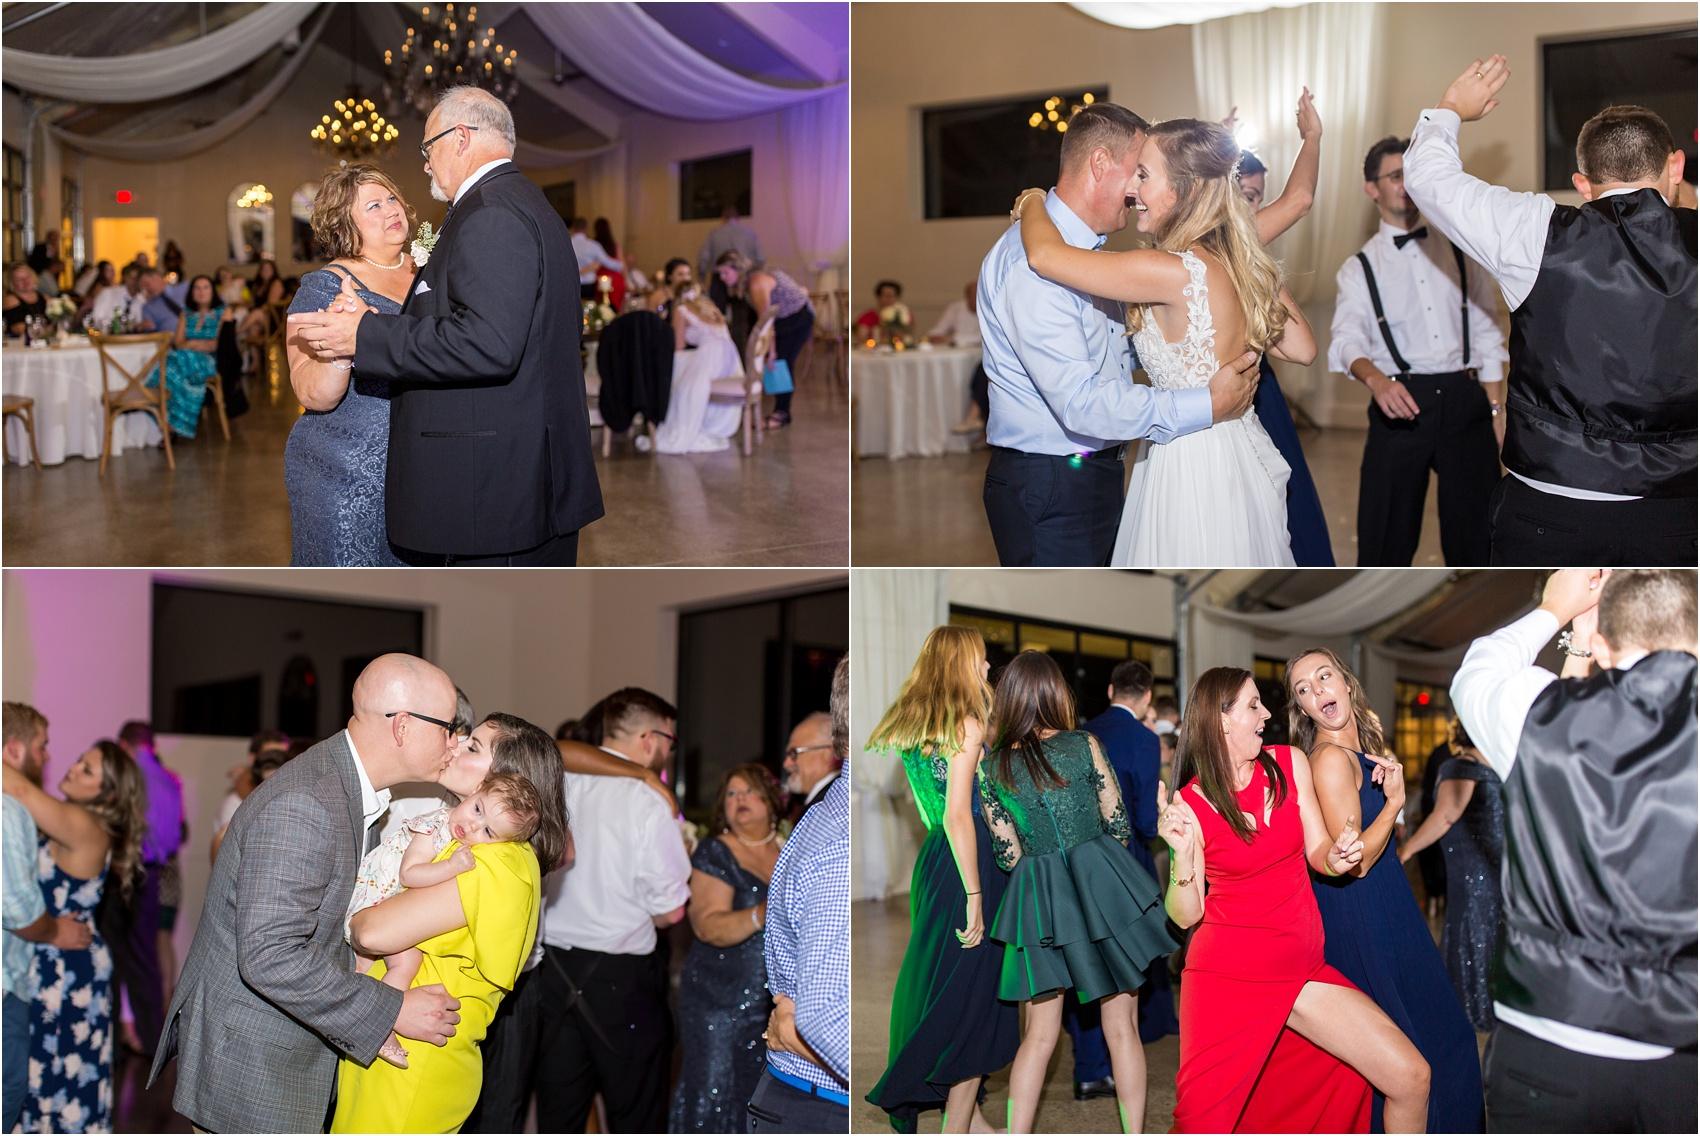 Savannah Eve Photography- Jurek-Woodworth Wedding- Sneak Peek-107.jpg